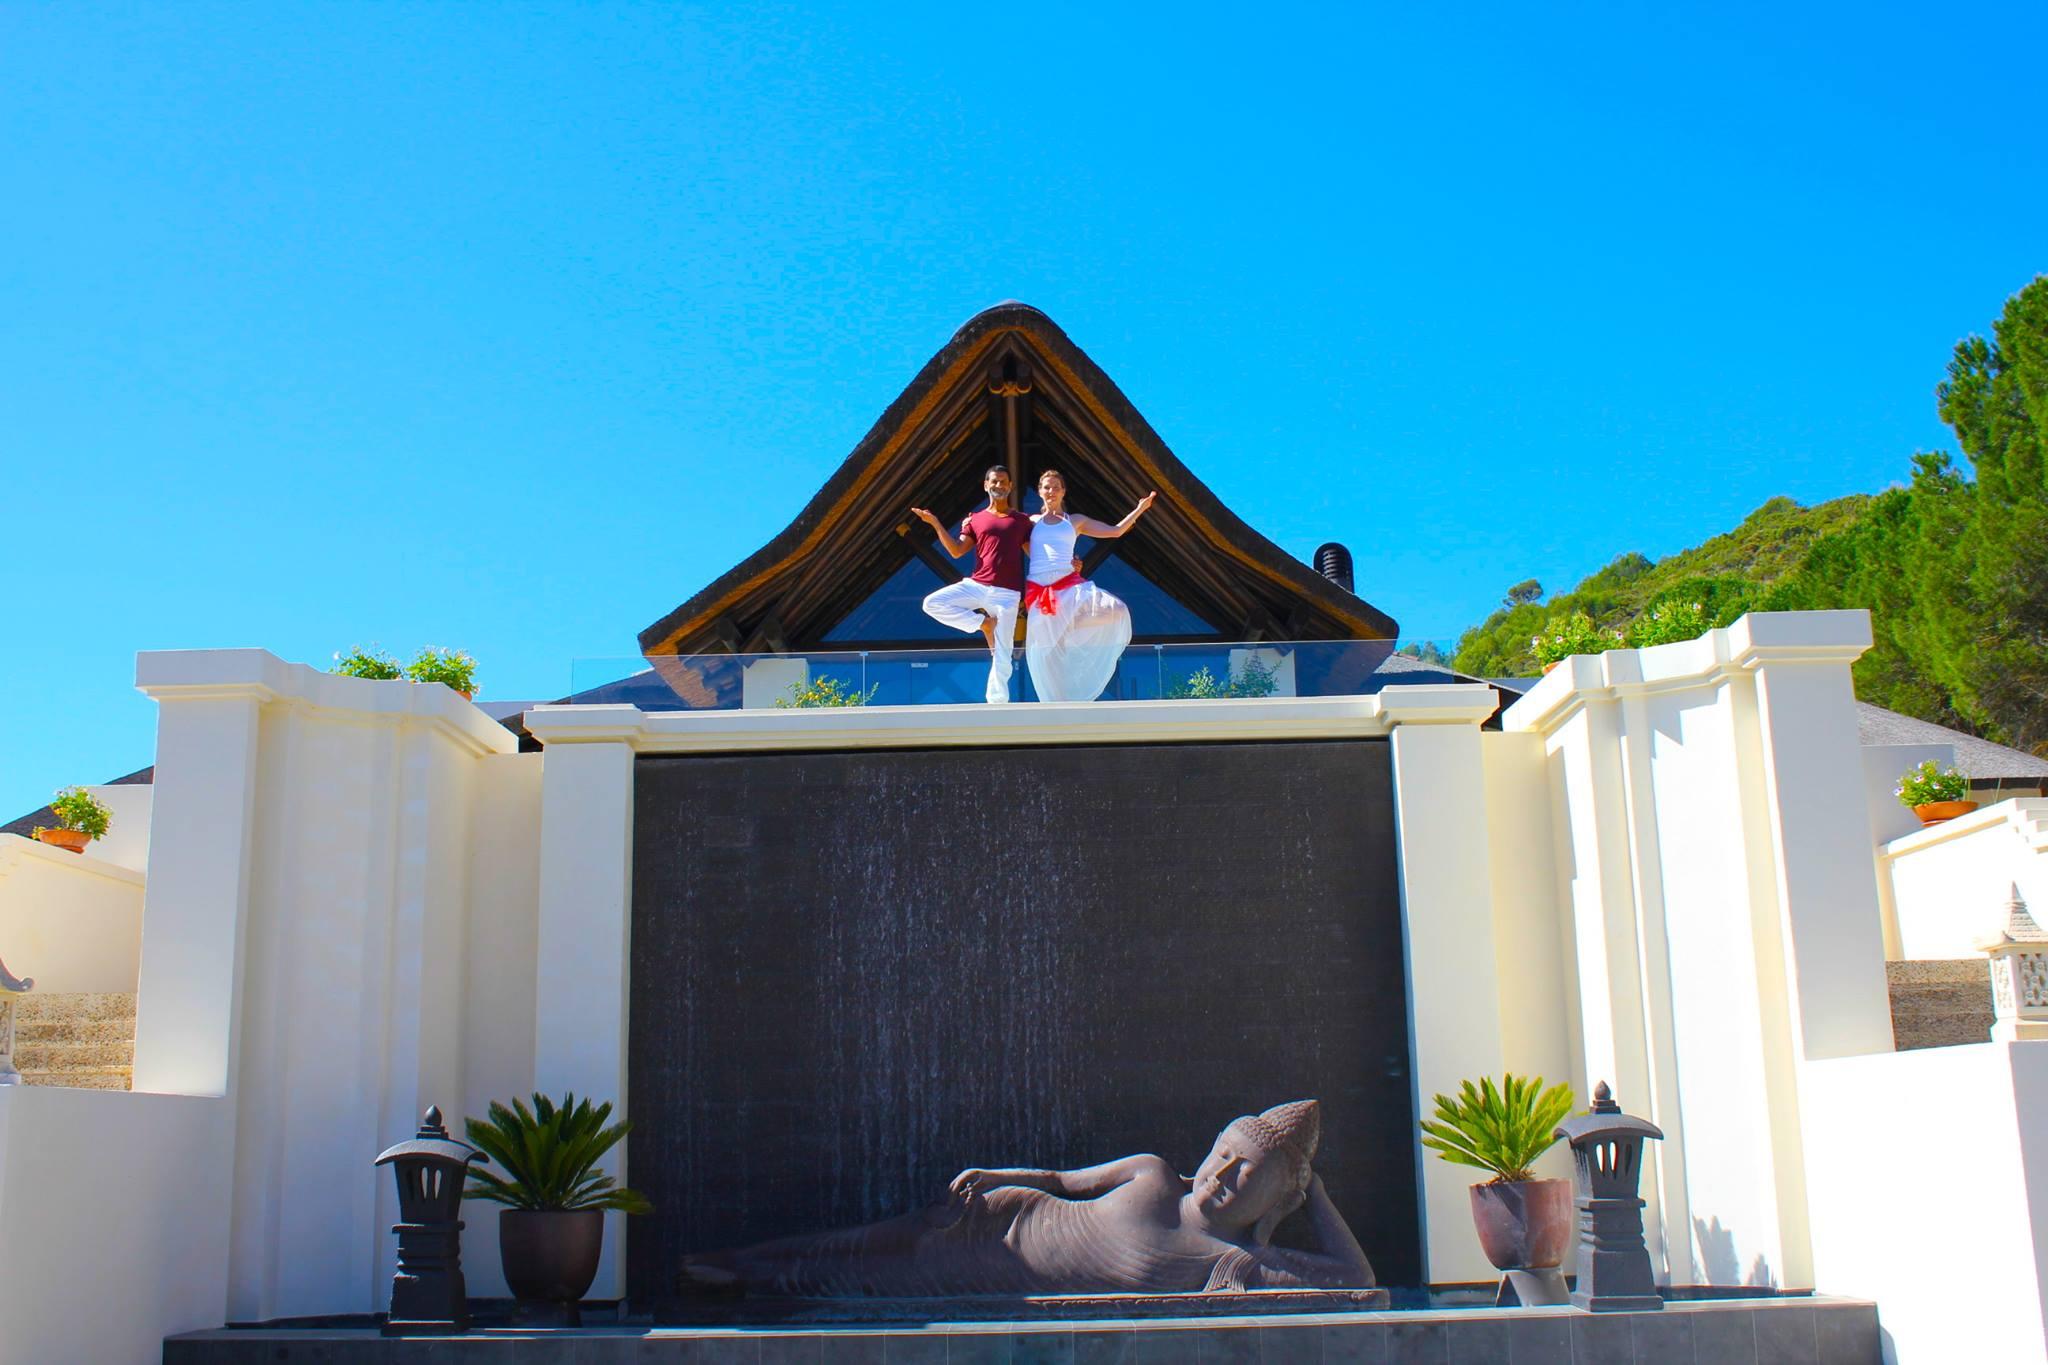 shanti-som-wellbeing-retreat-spain-12